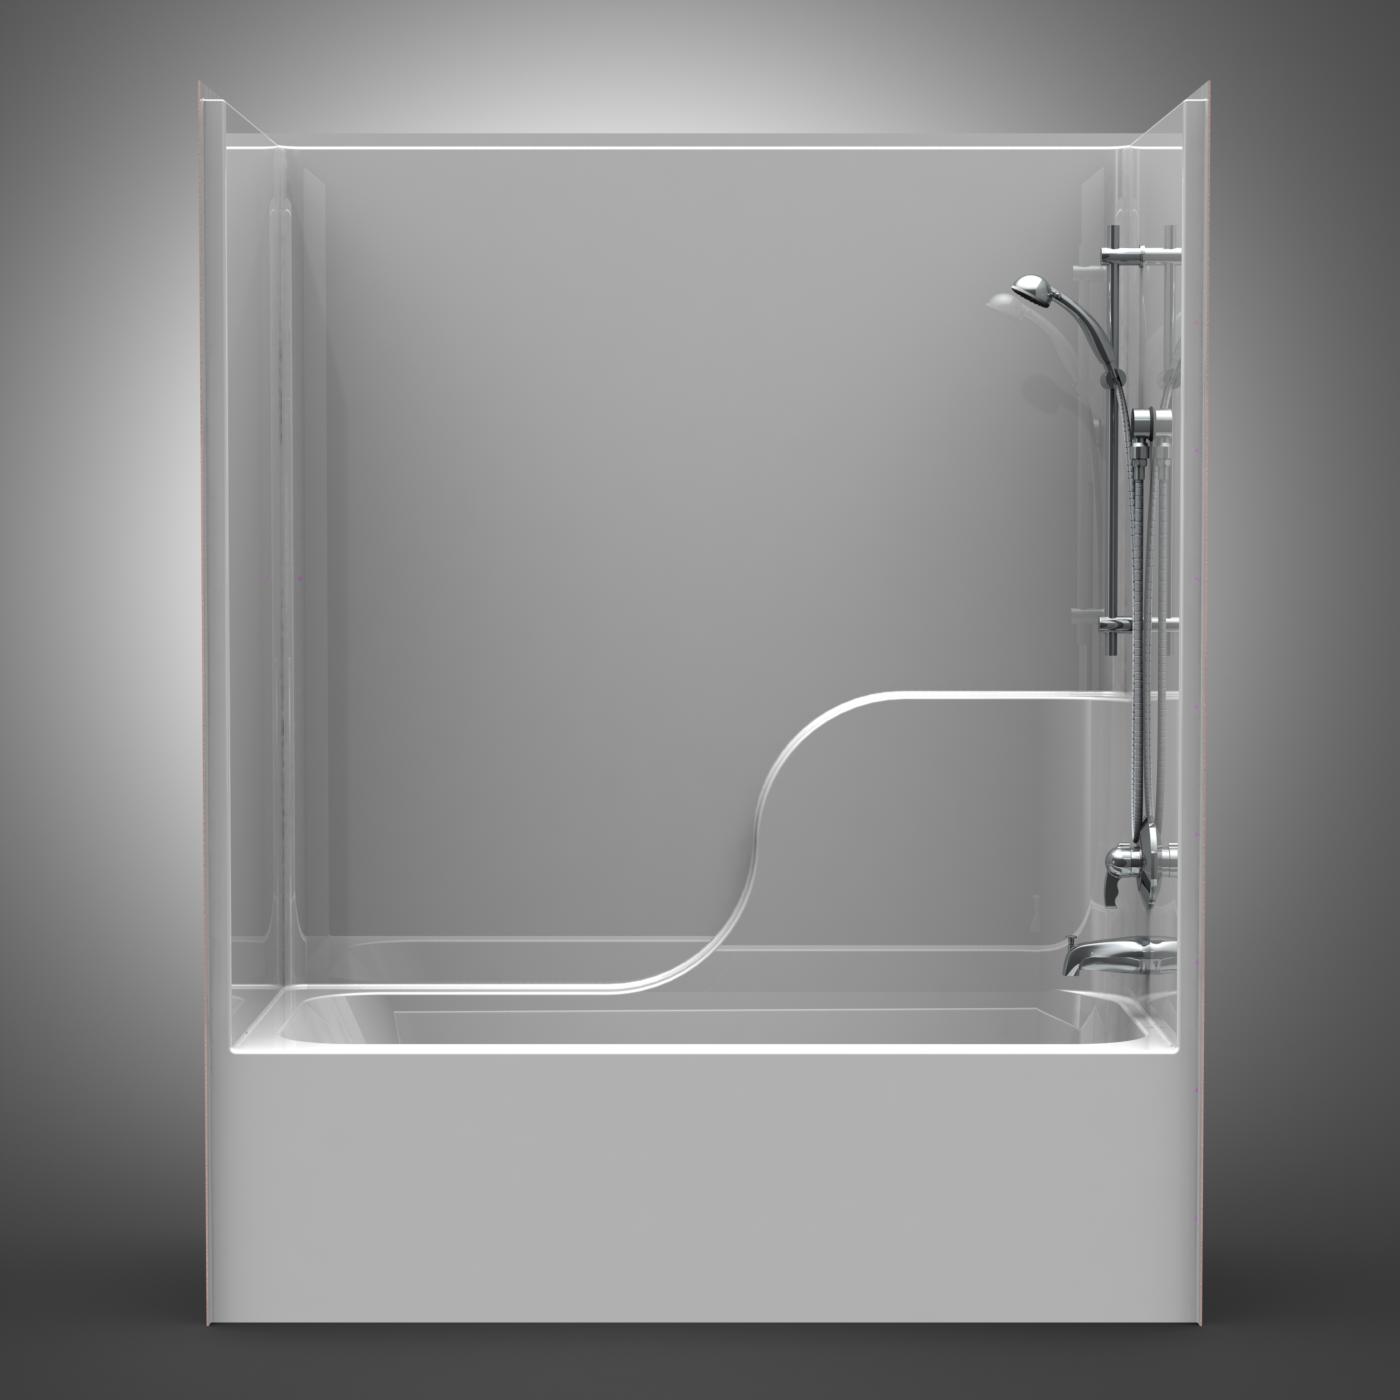 Builder Tub/Shower - One Piece 60x32 - Smooth Wall Look - Best Bath ...